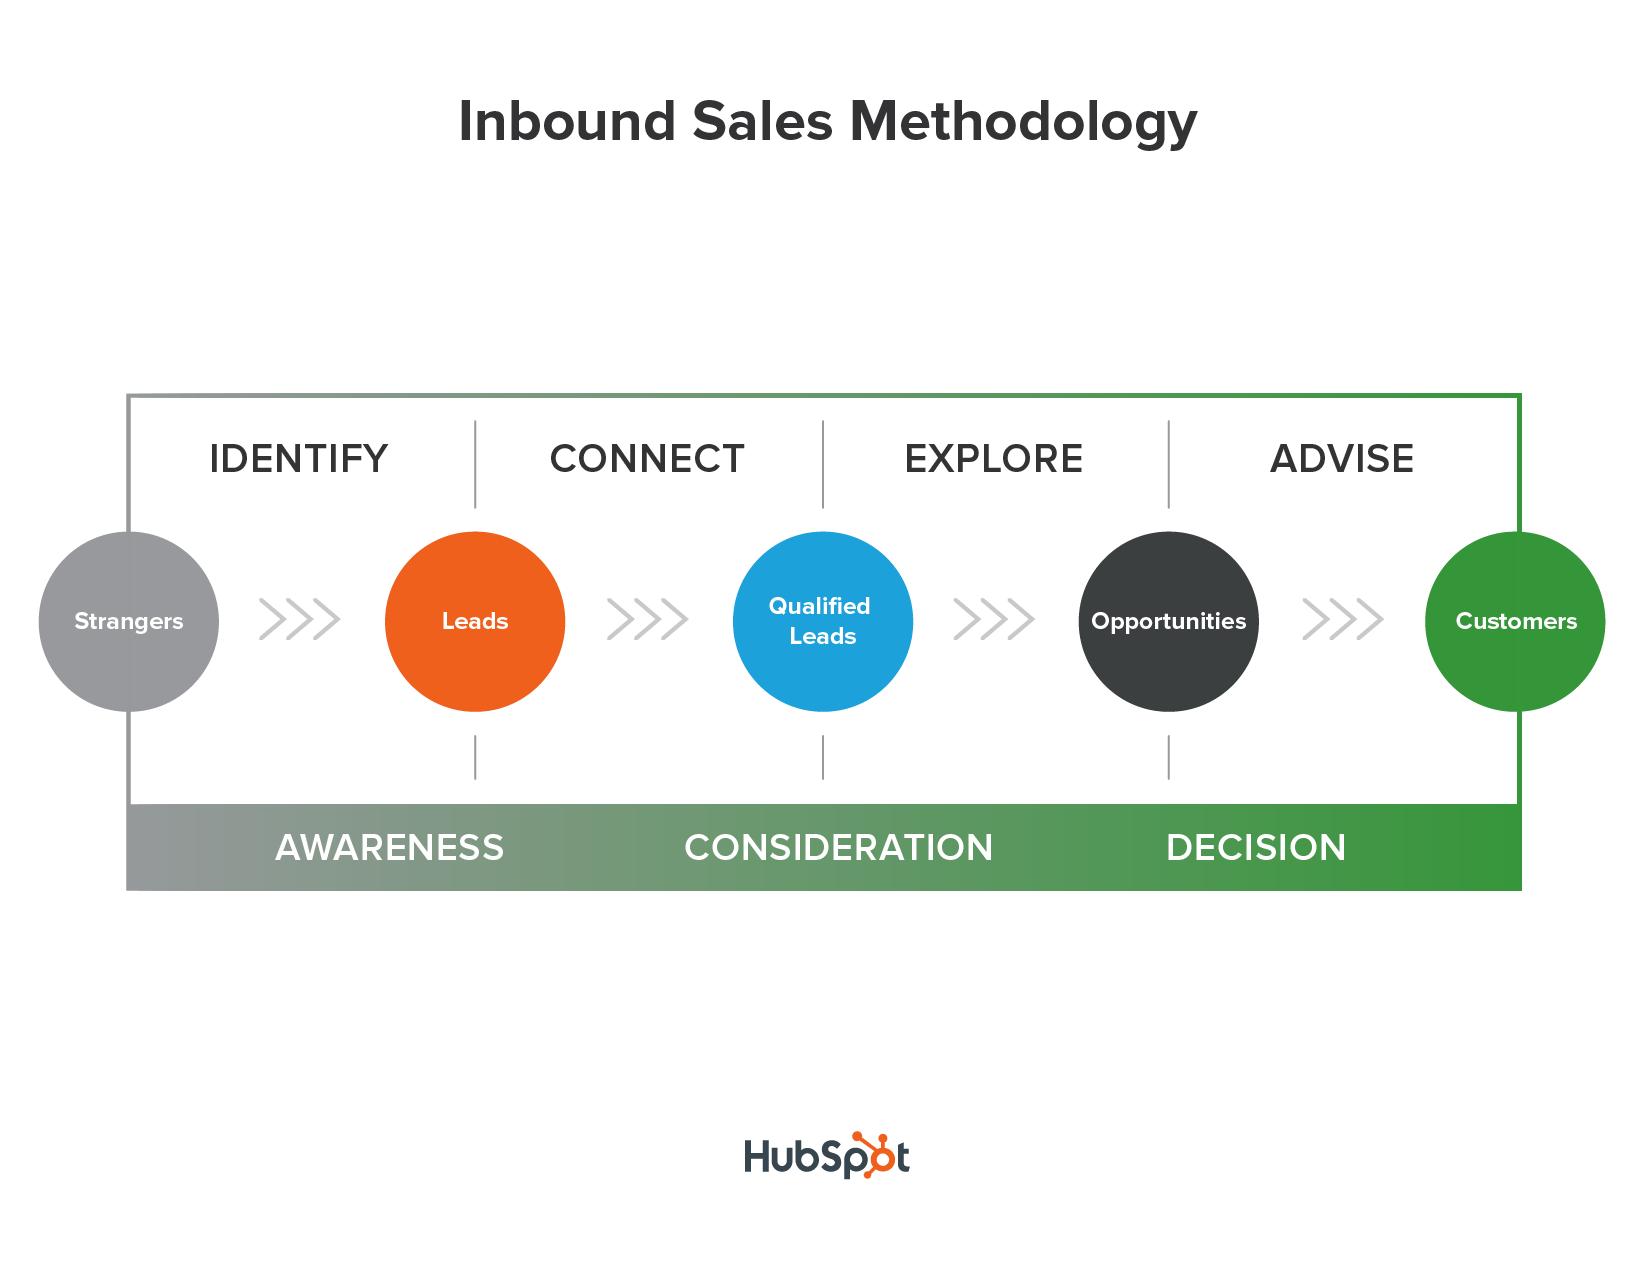 inbound-sales-methodology-1.png